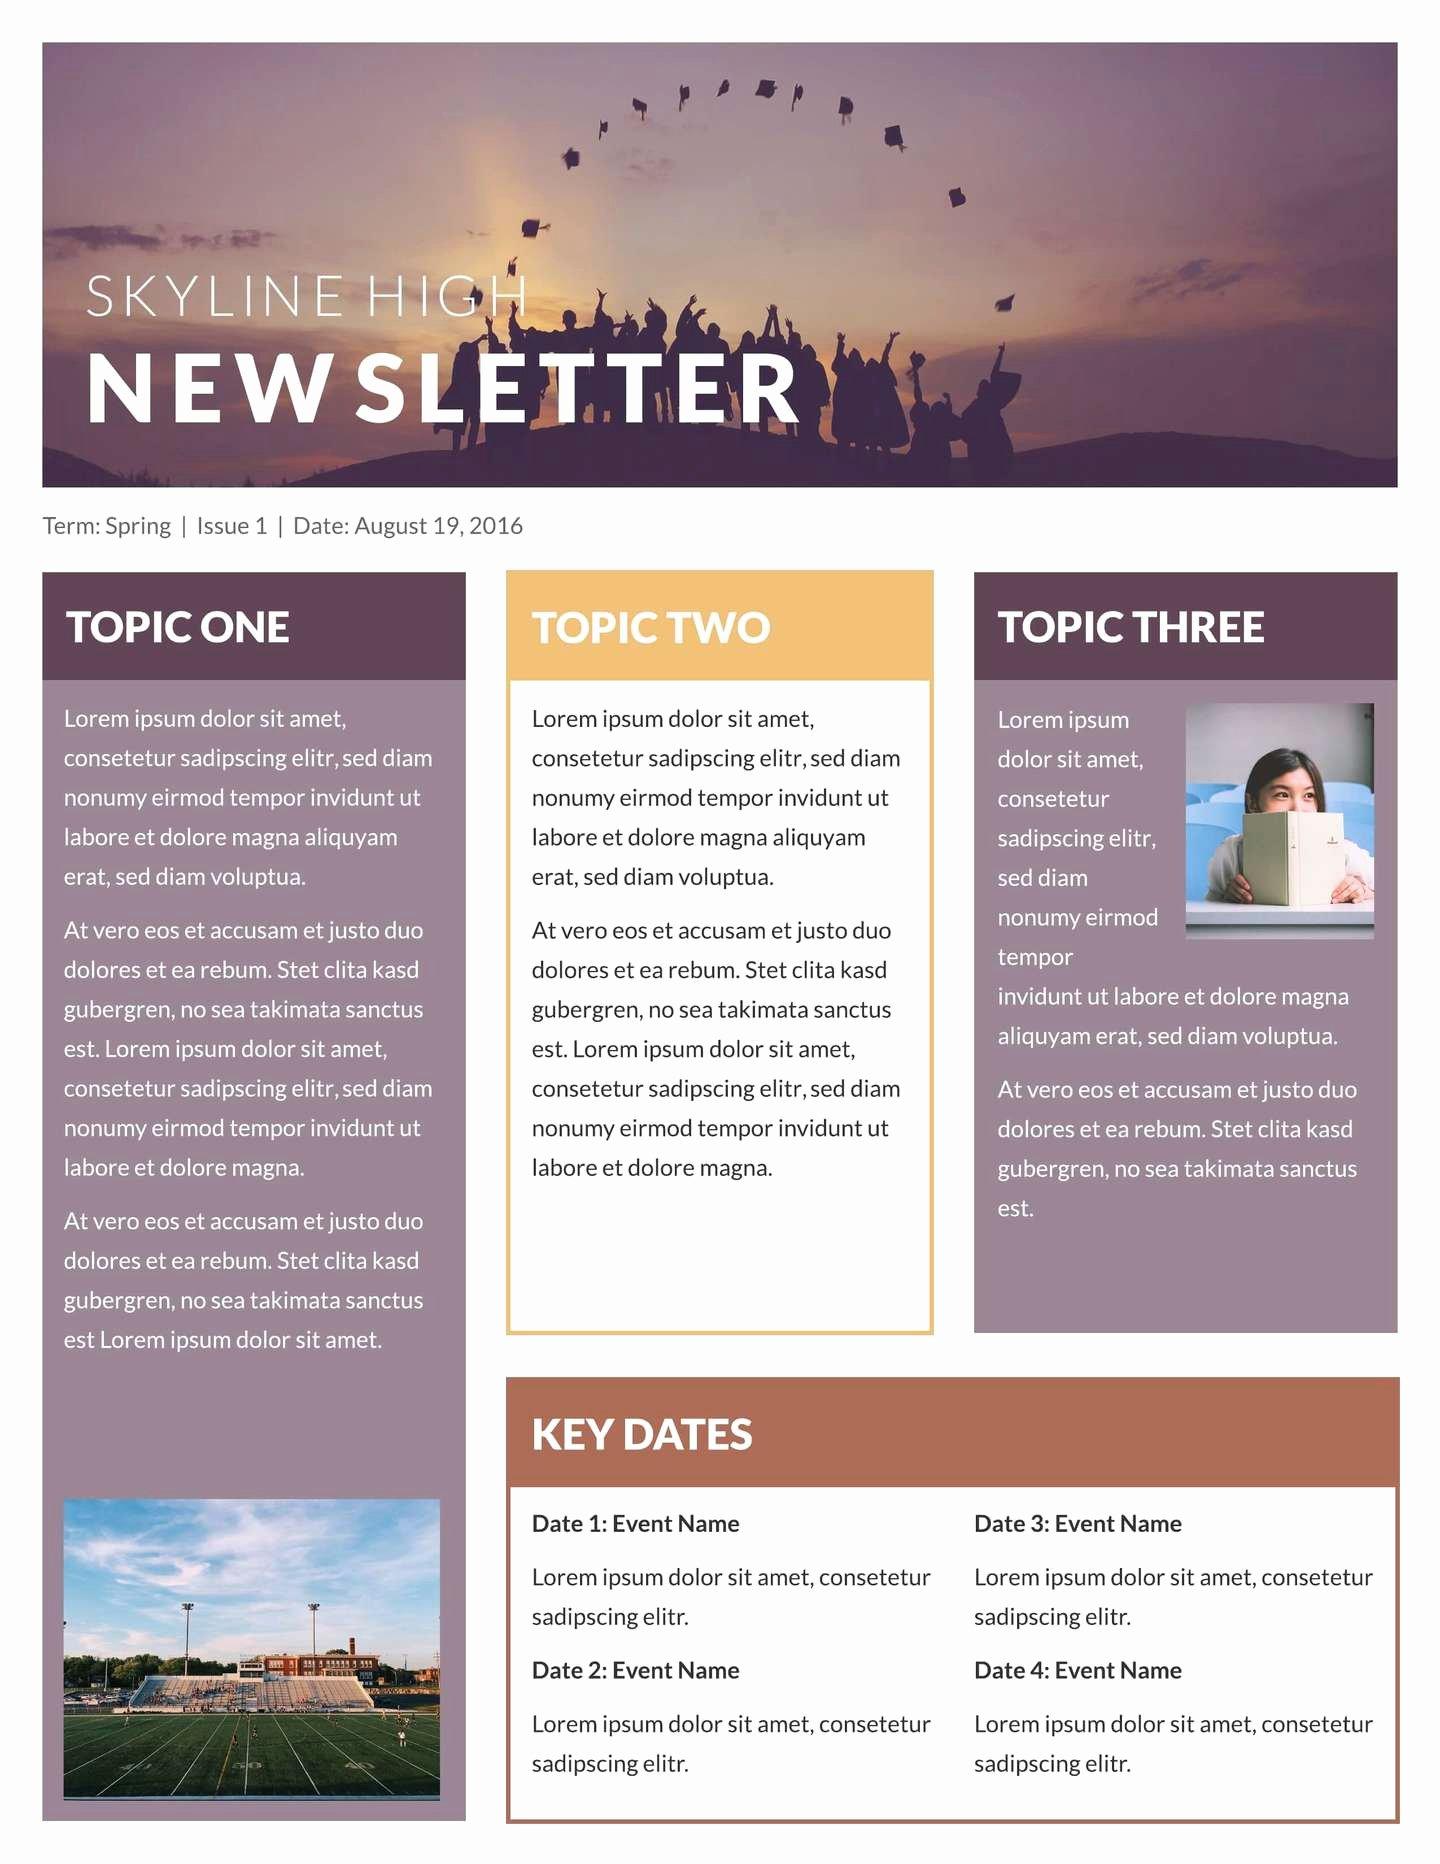 Free Printable Classroom Newsletter Templates Awesome Free Printable Newsletter Templates & Email Newsletter